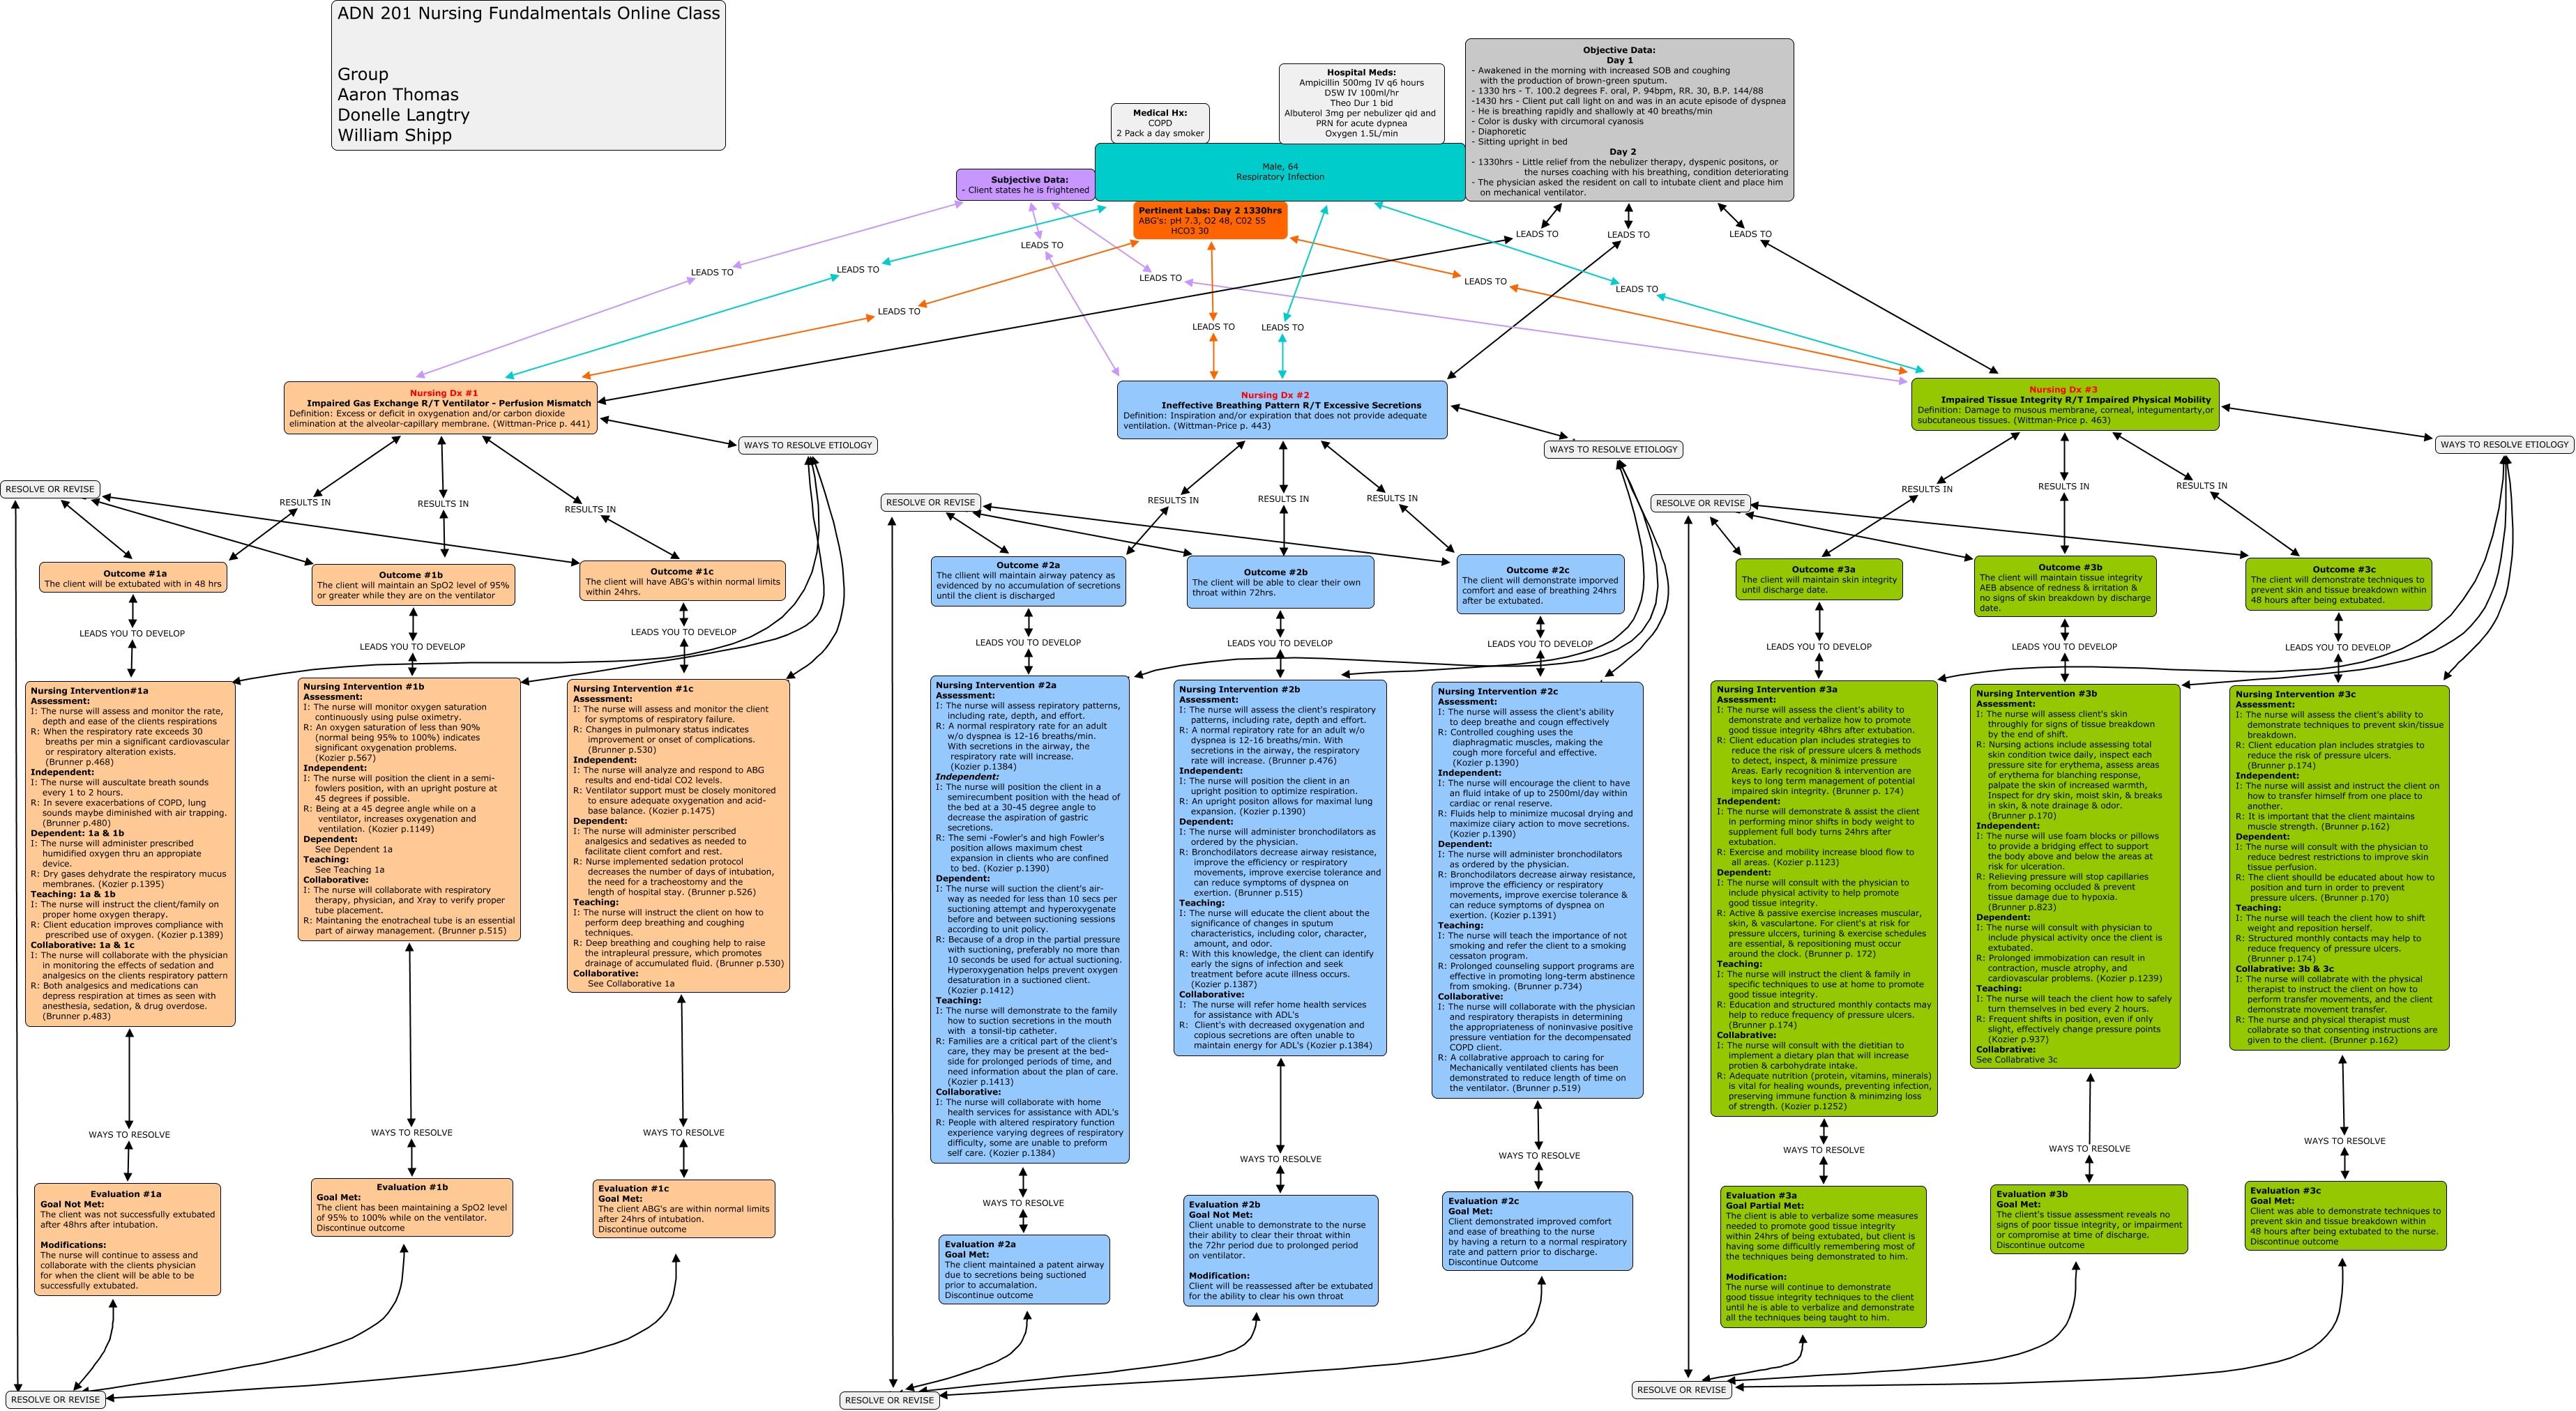 Adn201 Nursing Process Group Project 2